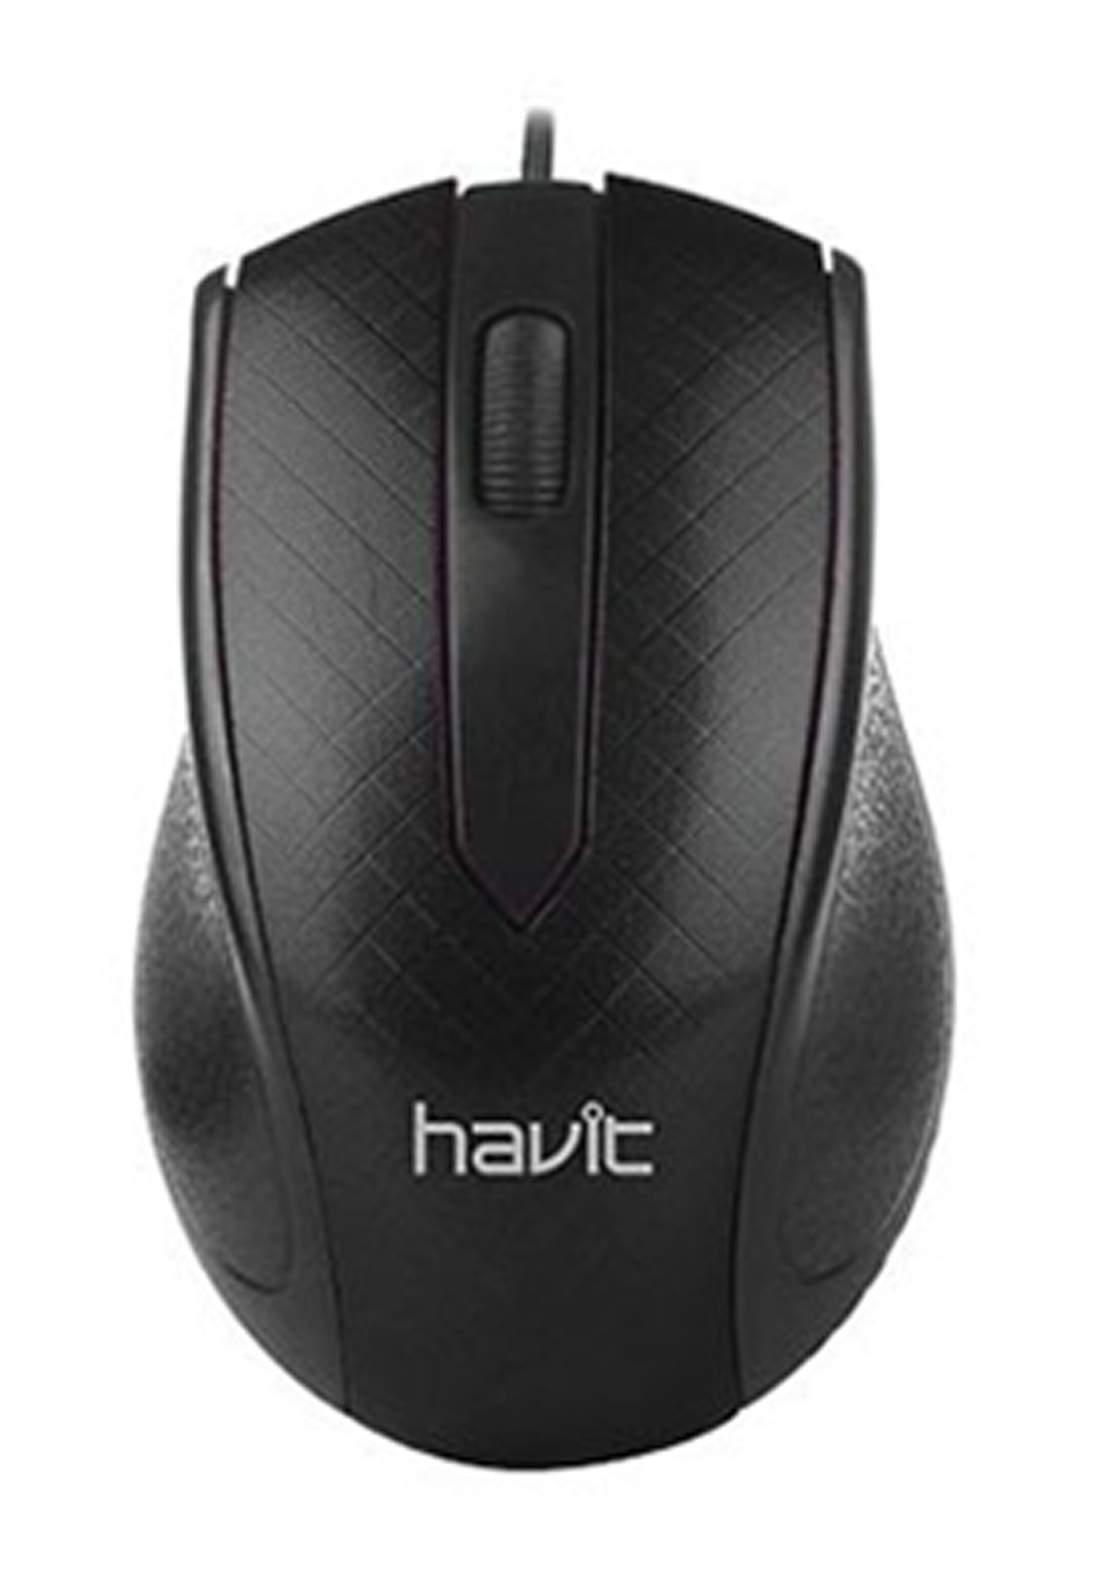 Havit HV-MS80 Gaming Mouse - Black ماوس